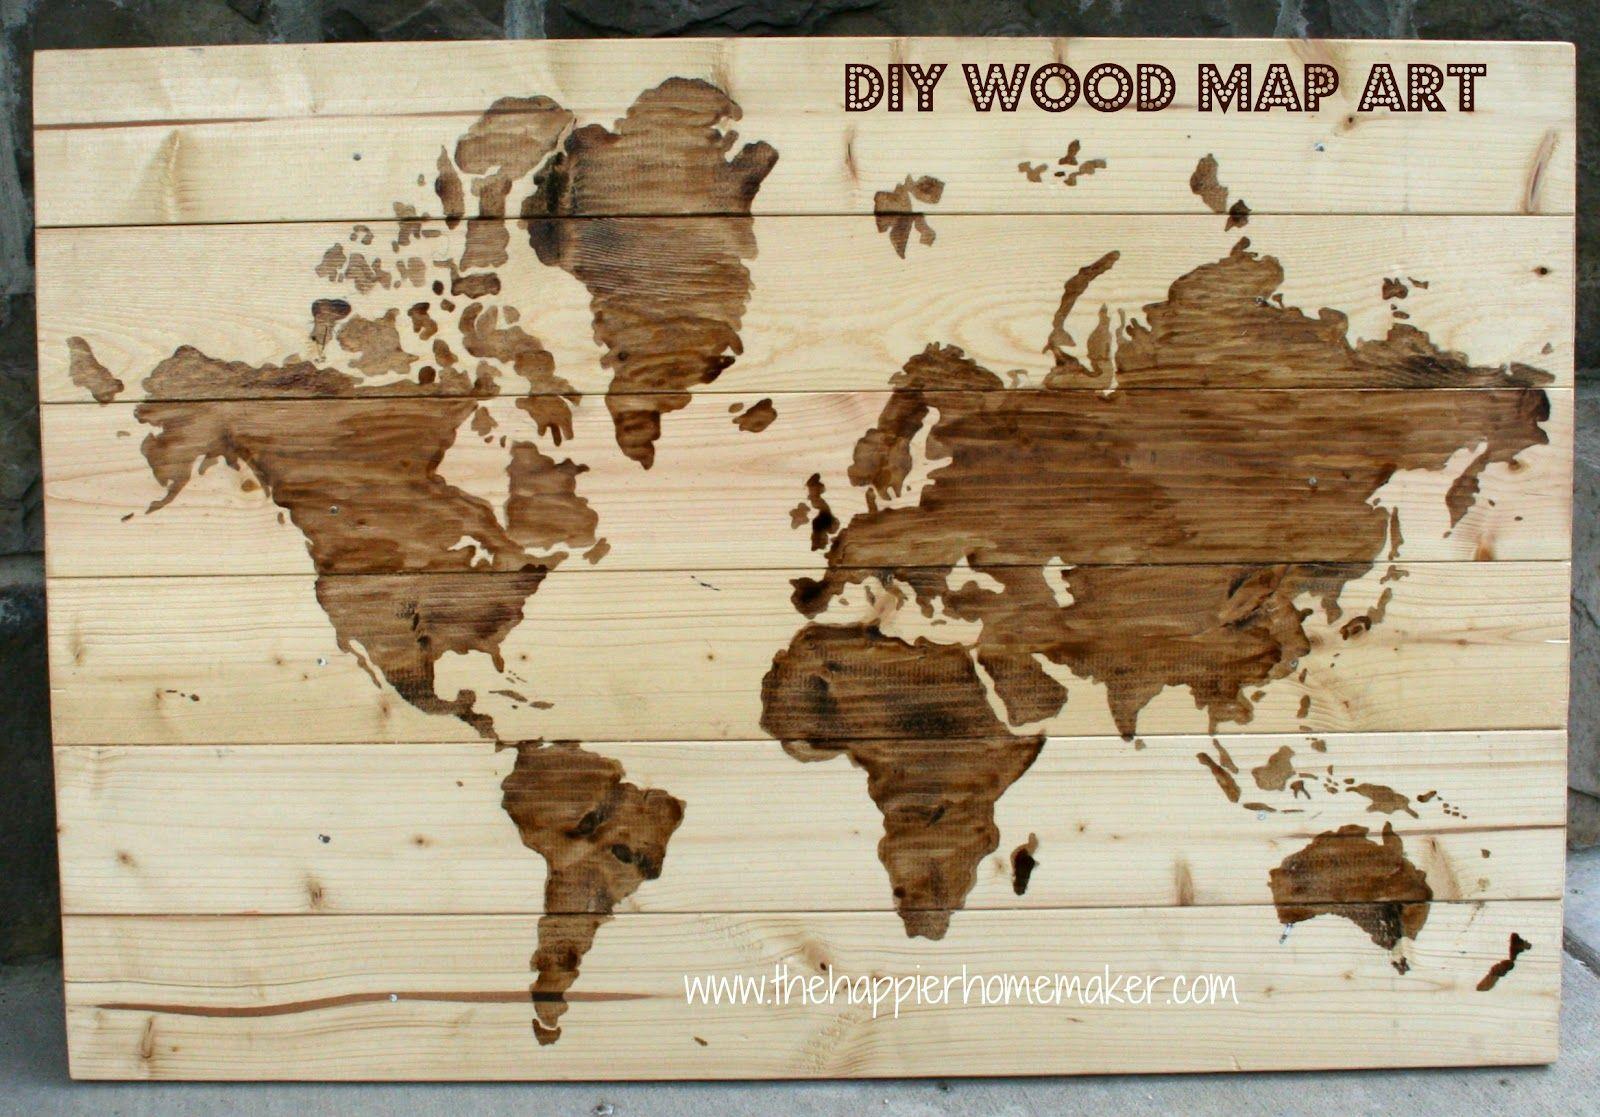 The Happier Homemaker: DIY Wooden World Map Art